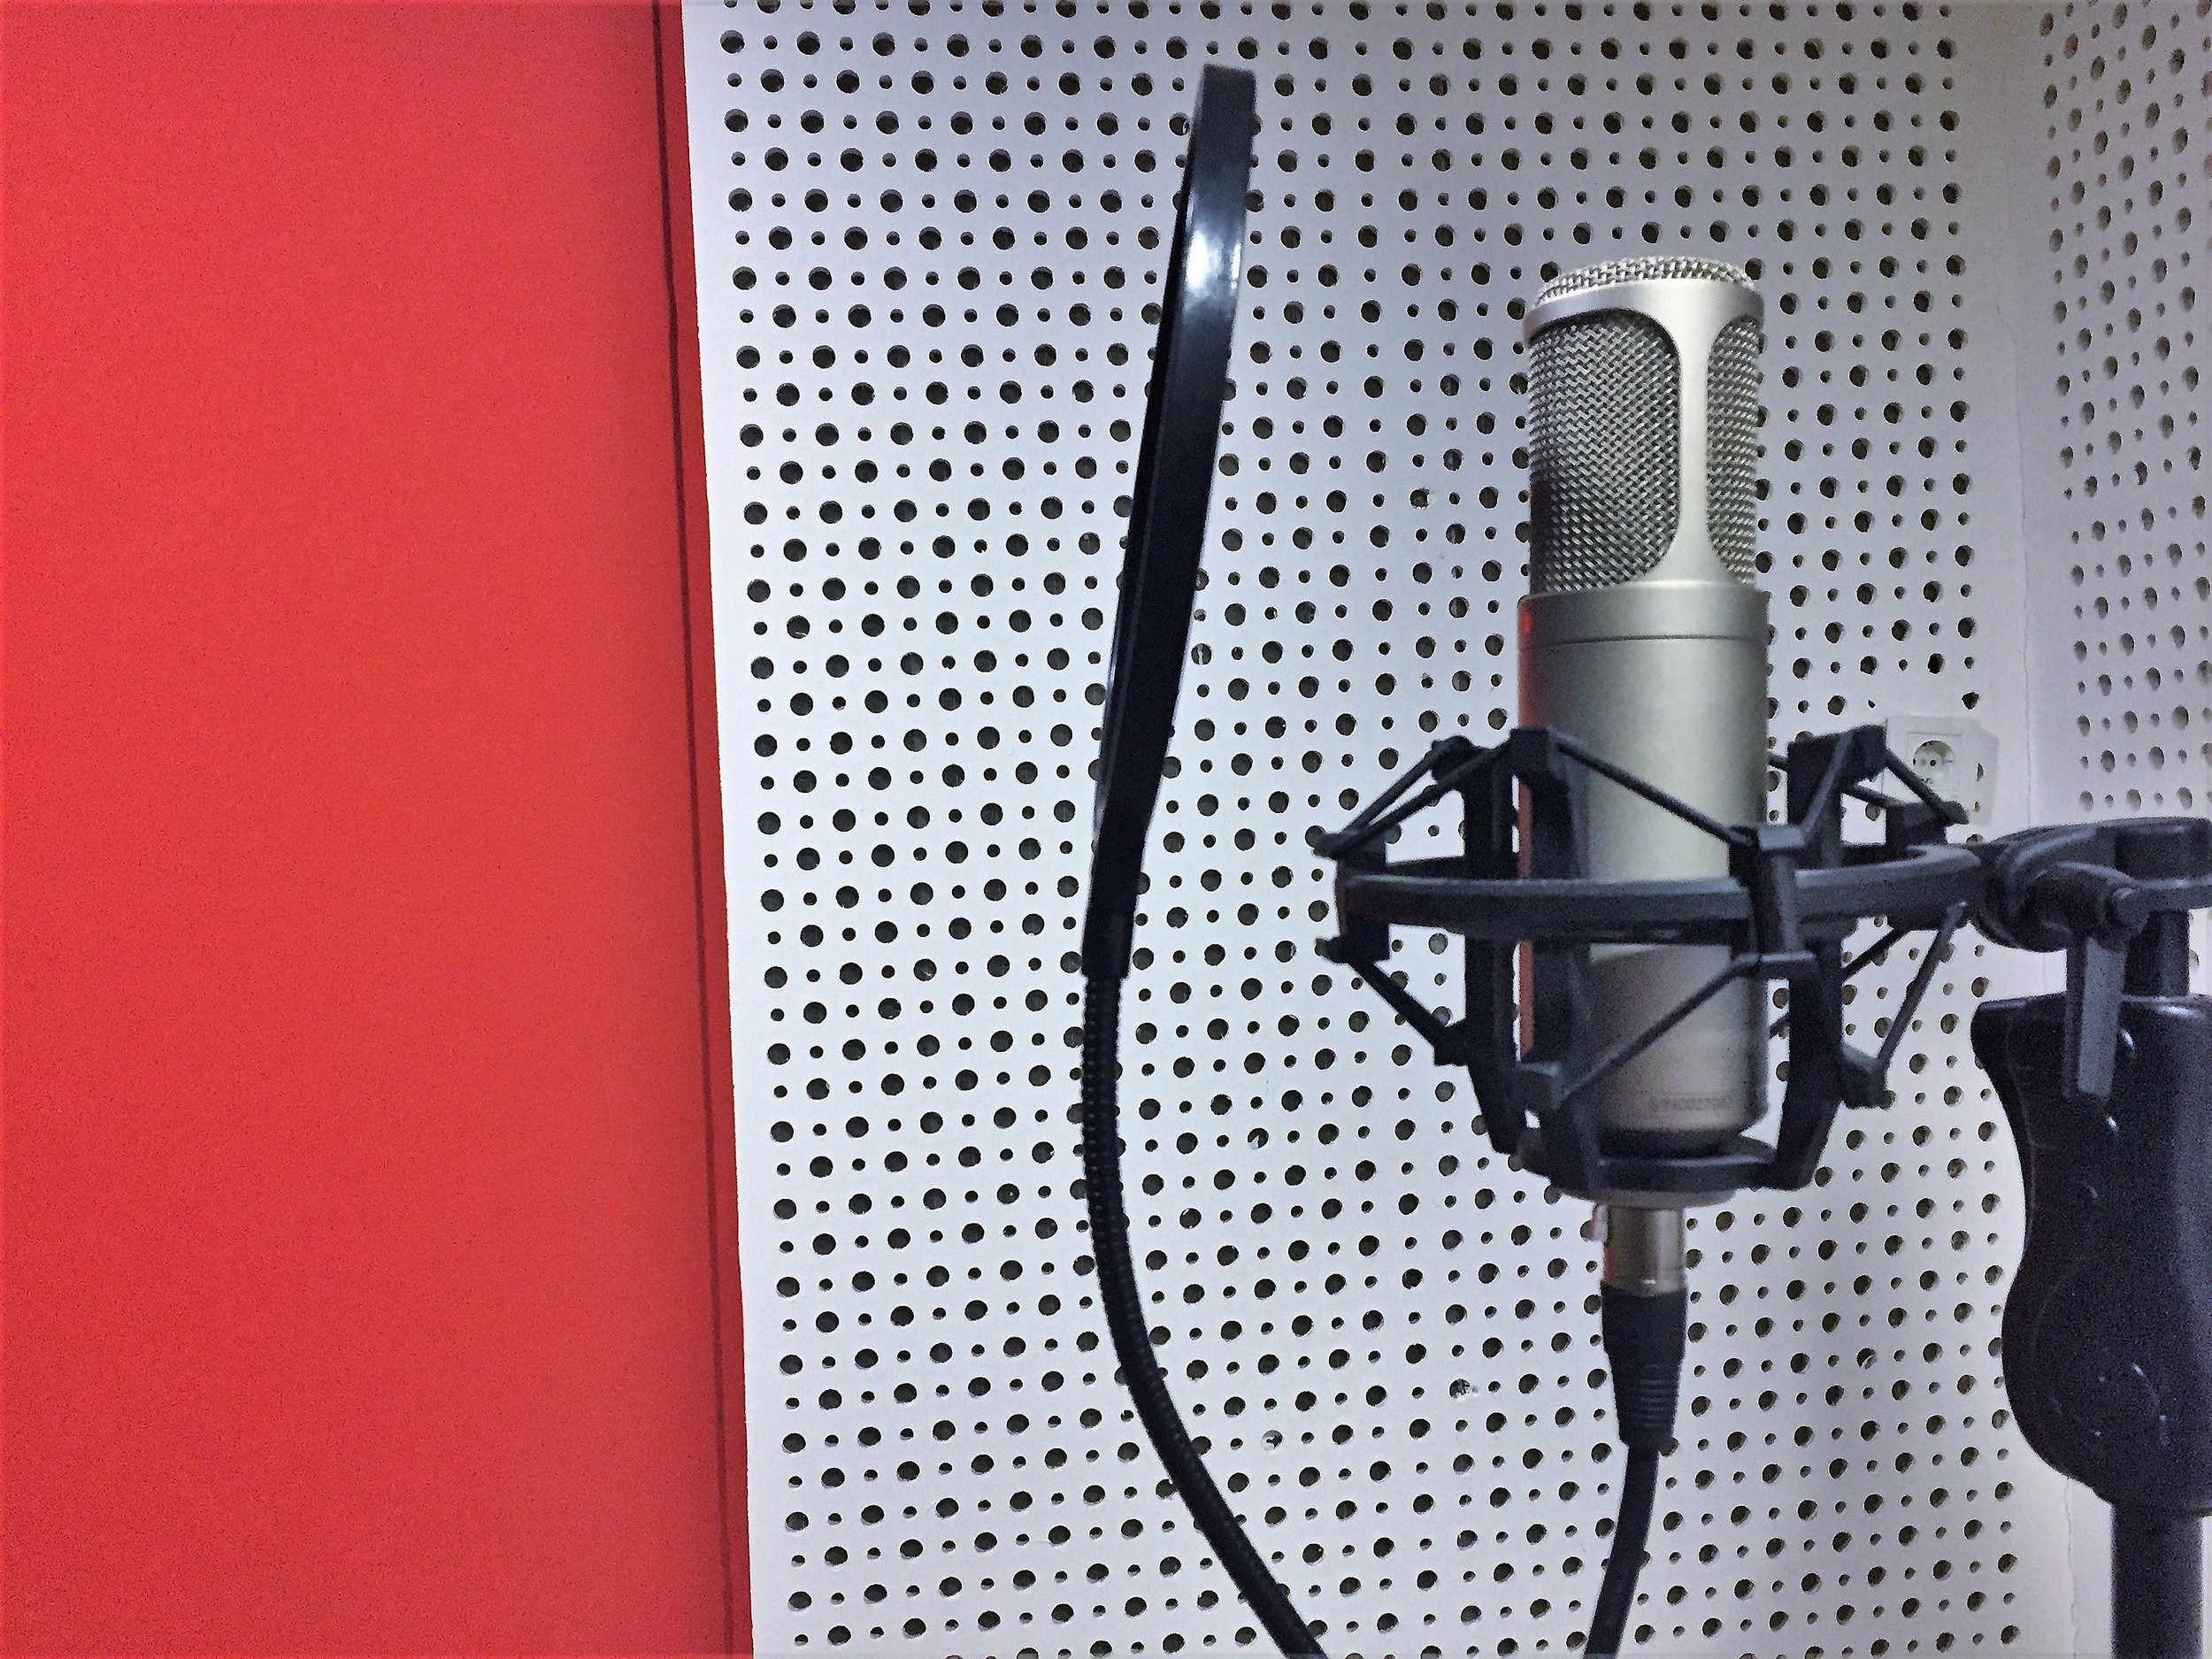 red_mic.jpeg